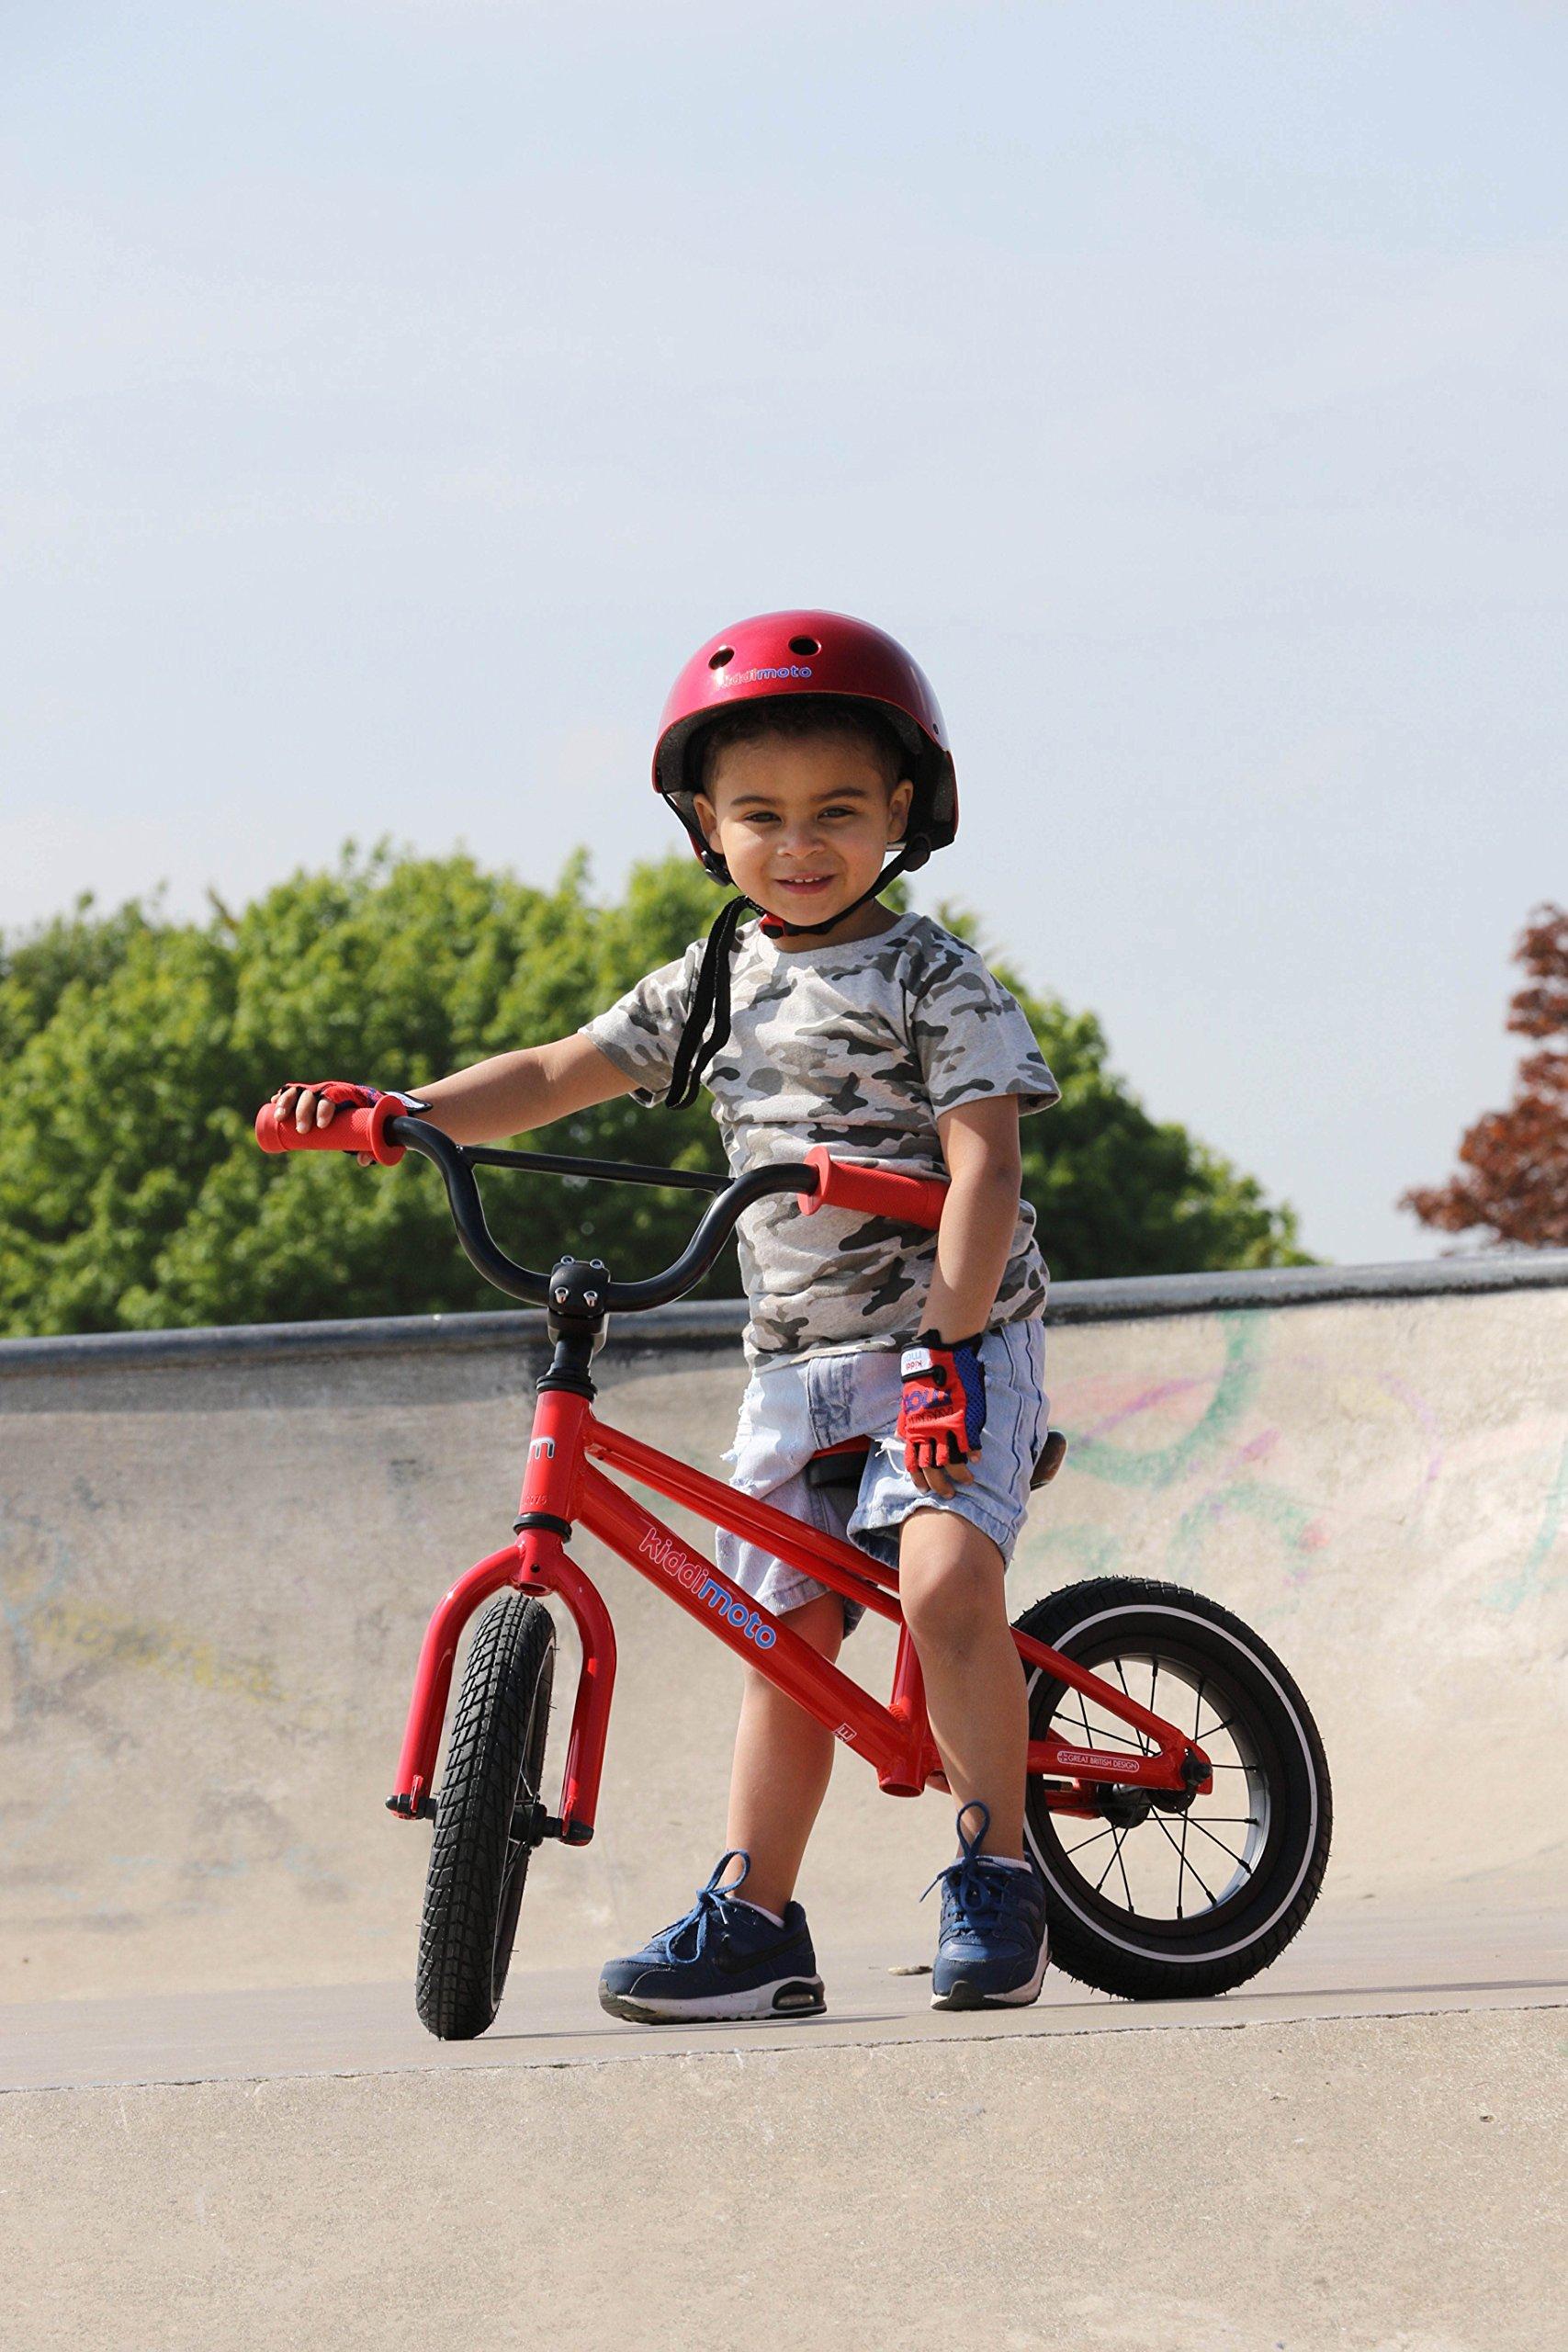 Kiddimoto BMX Running/Balance Bike, Red by Kiddimoto (Image #4)